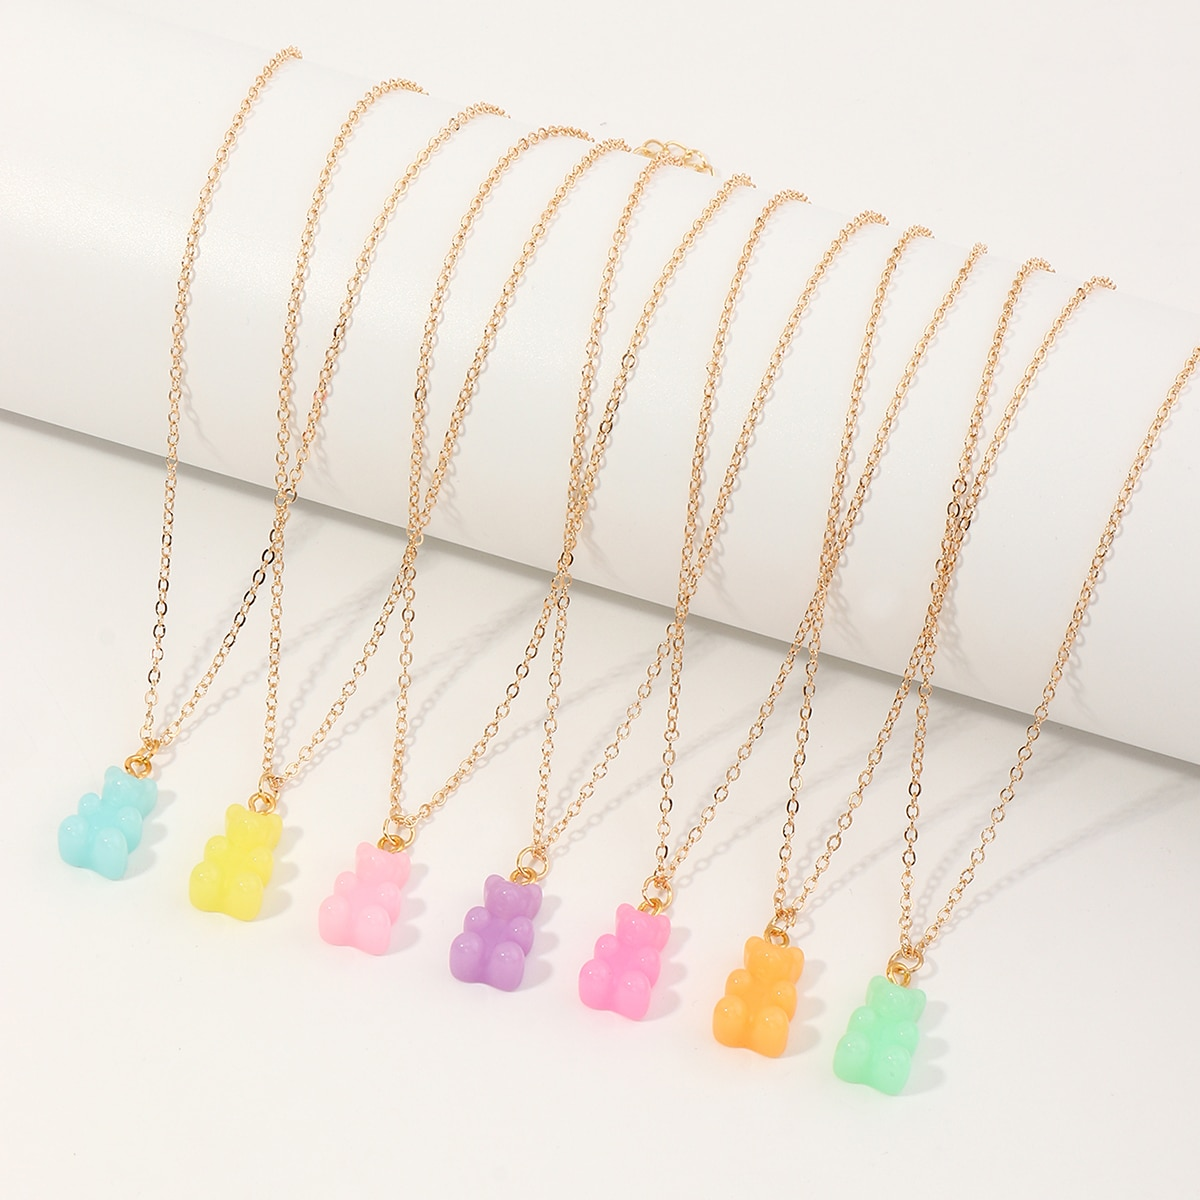 7pcs Girls Bear Charm Necklace